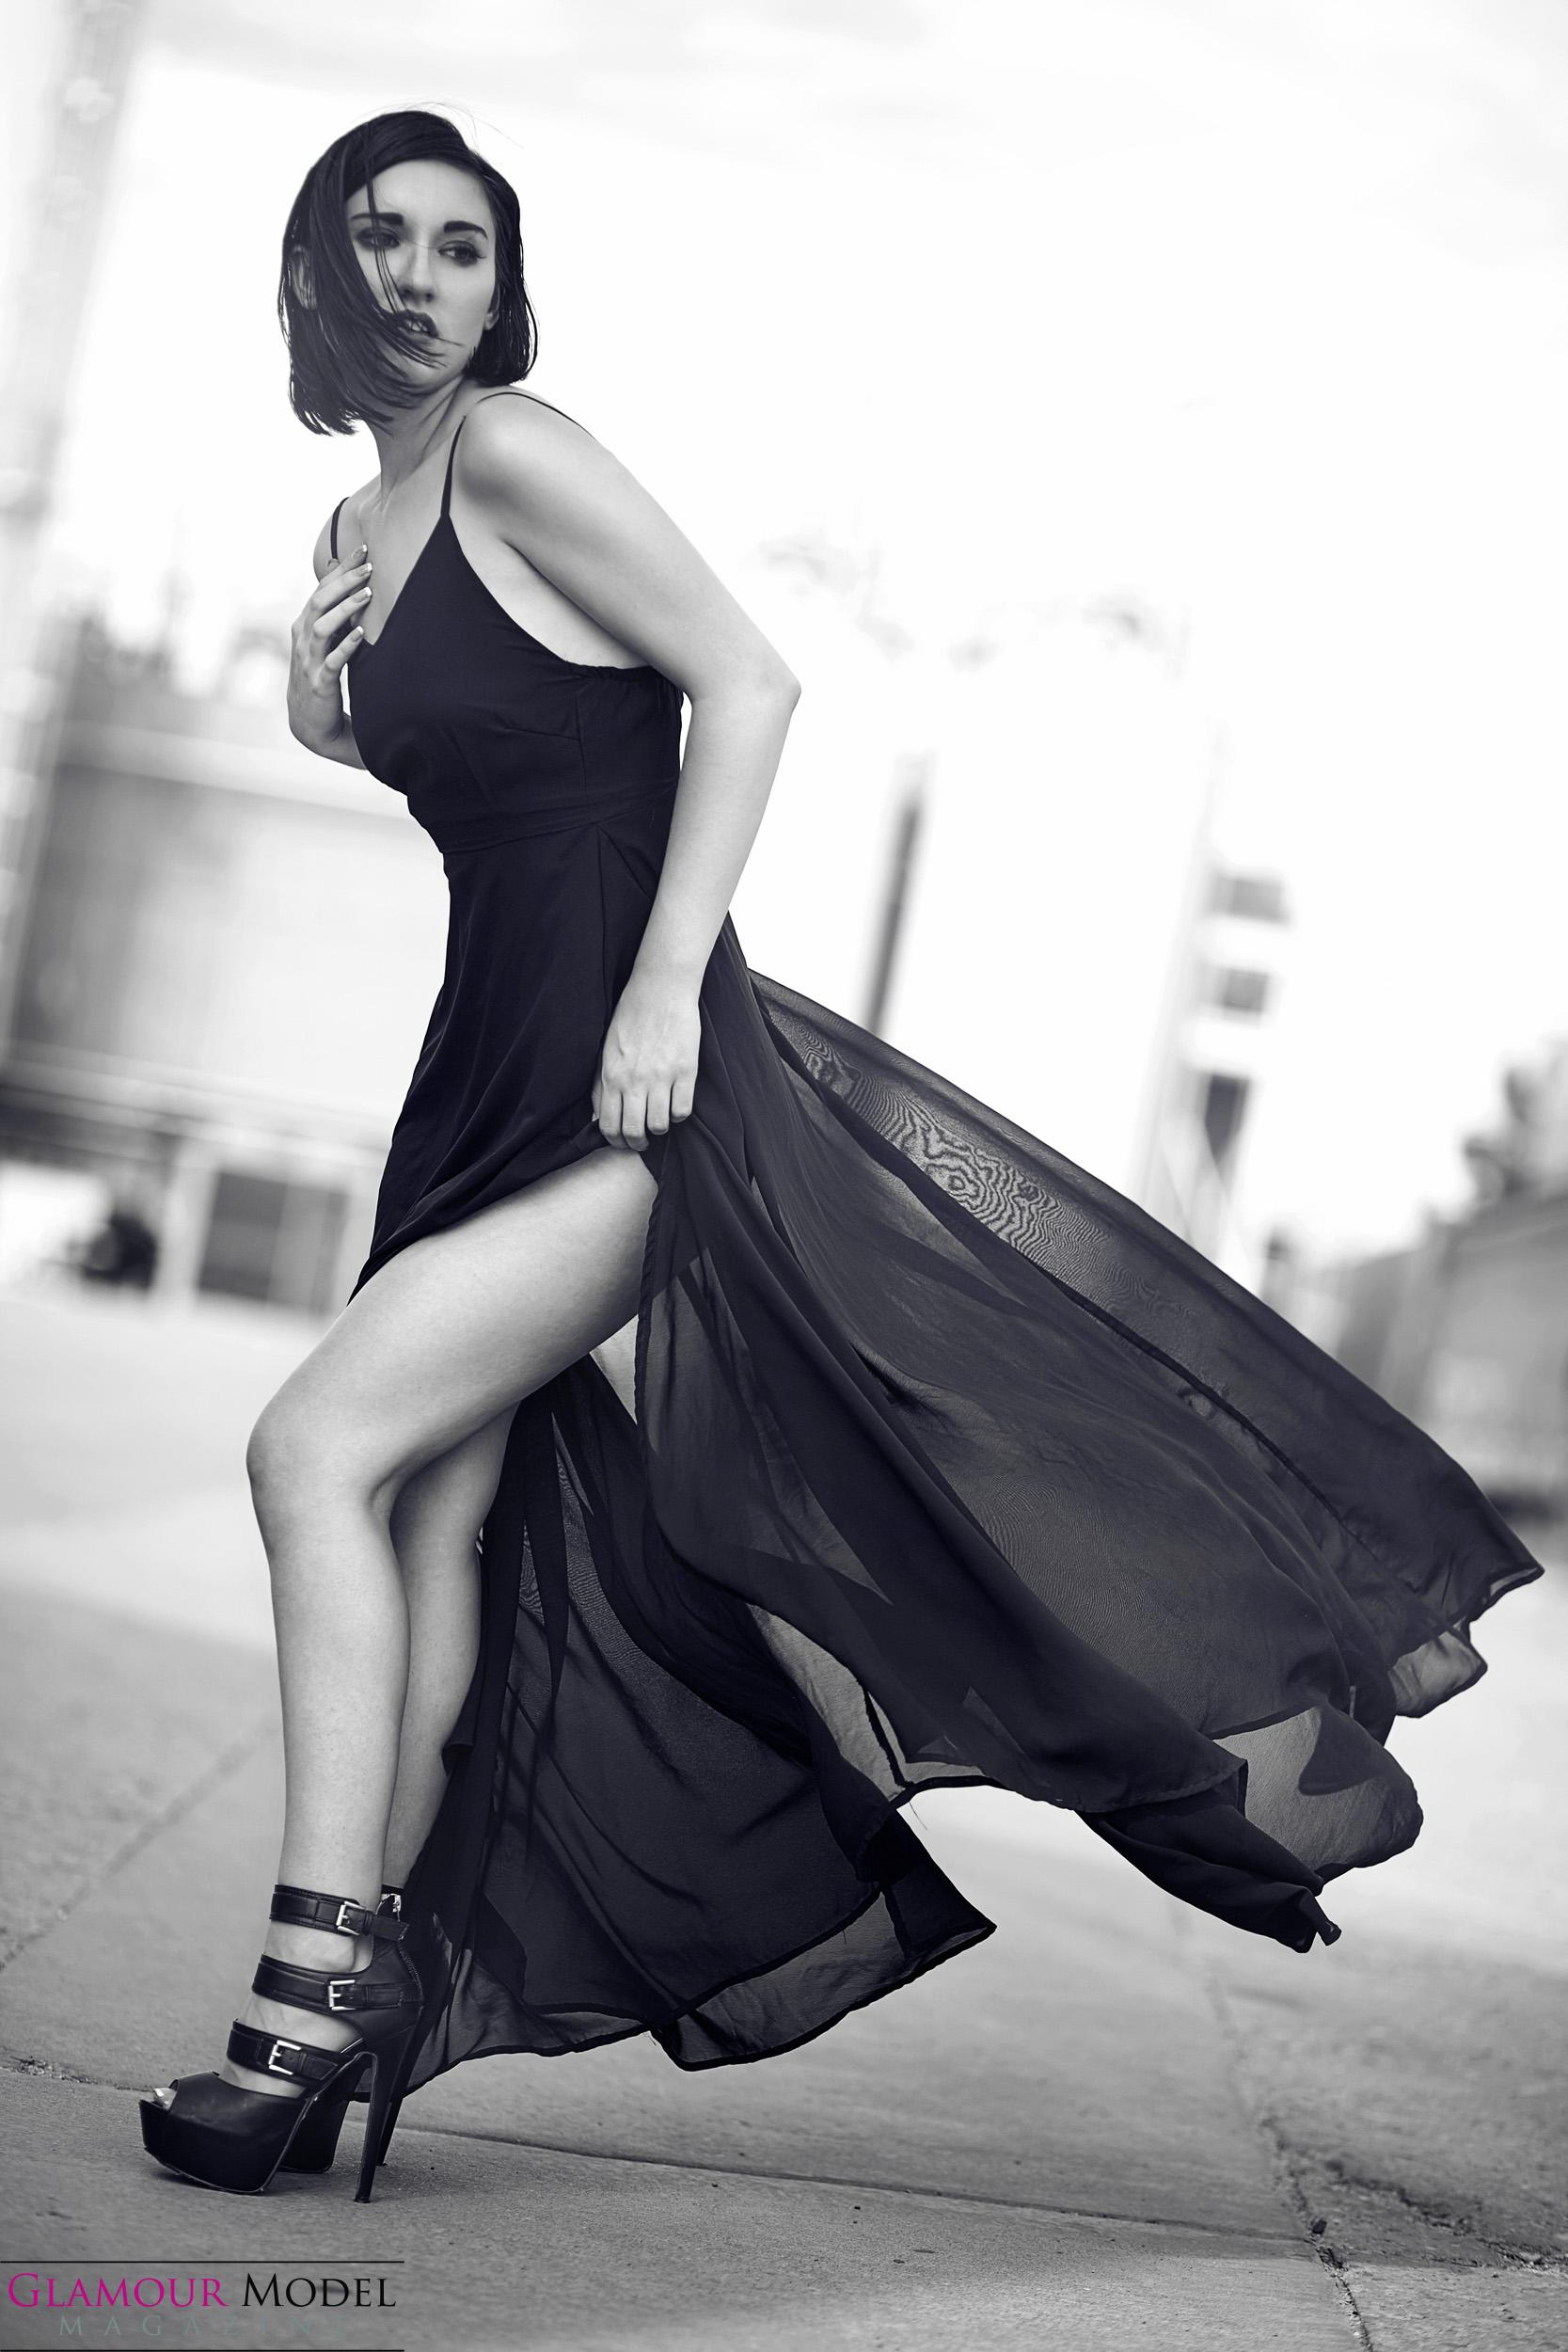 Beautiful Becca Briggs shot by GMM Staffer Nino Batista